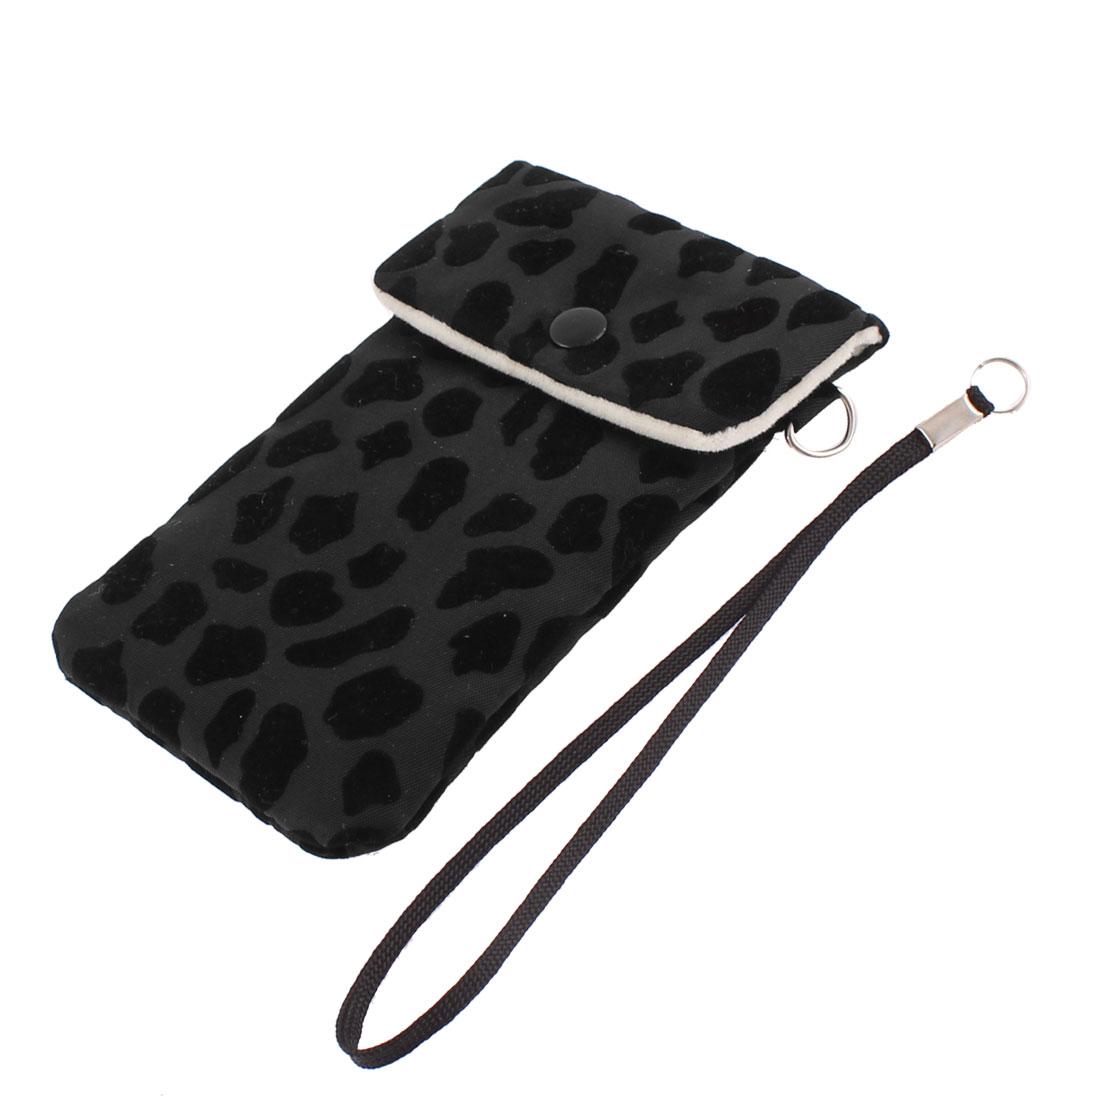 Outdoor Nylon Cell Phone Pouch Bag Mobile Case Holder Black